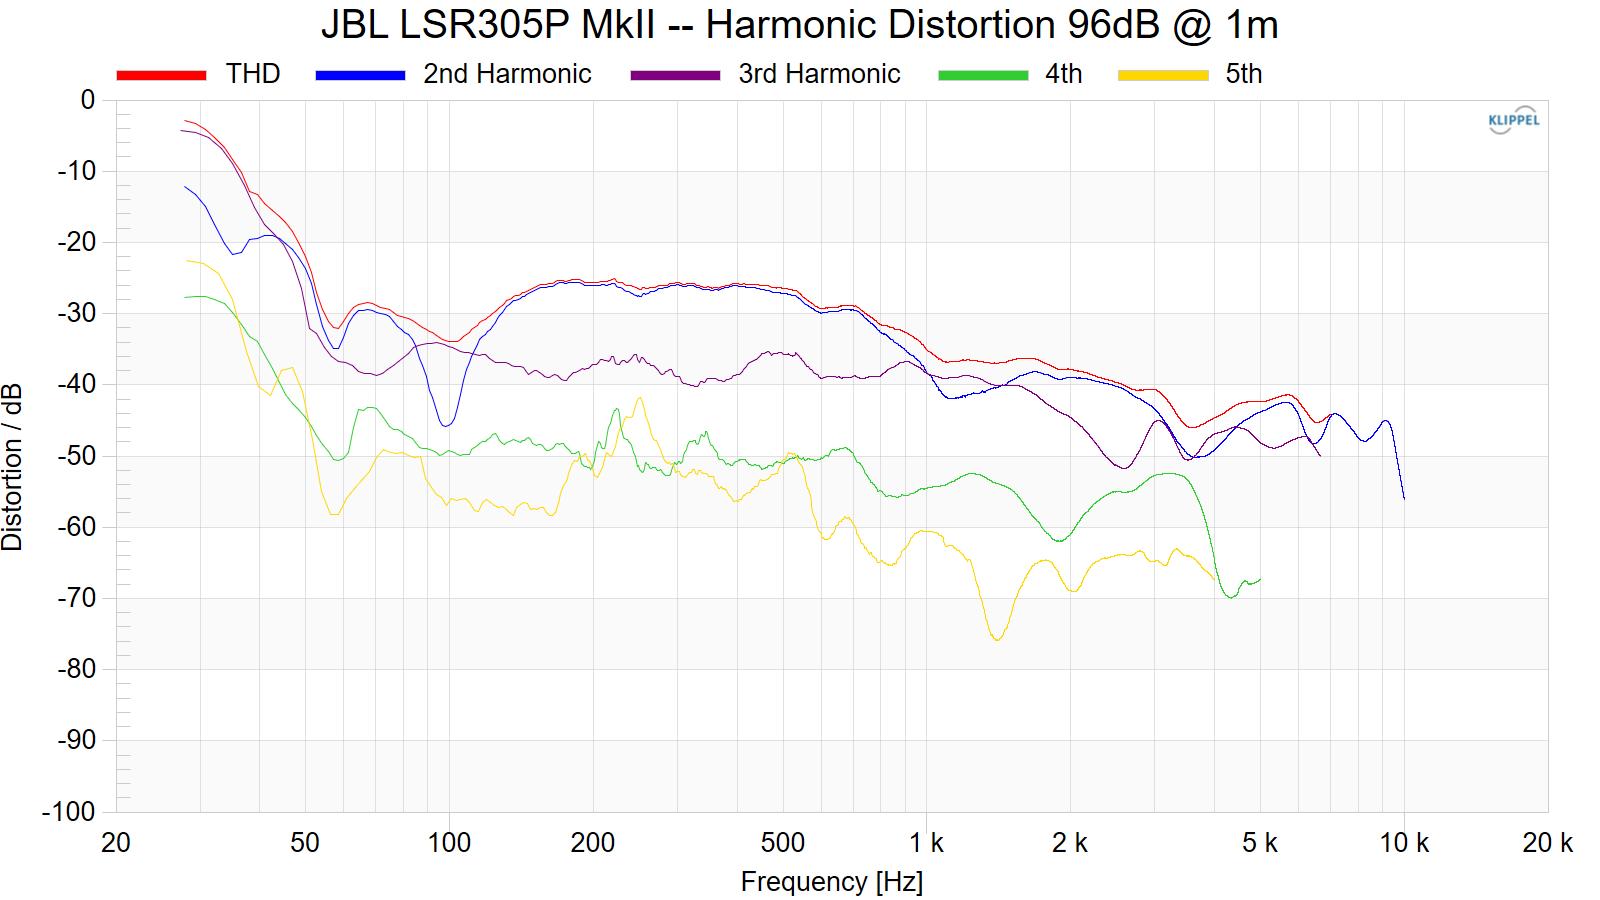 JBL%20LSR305P%20MkII%20--%20Harmonic%20Distortion%2096dB%20%40%201m.png